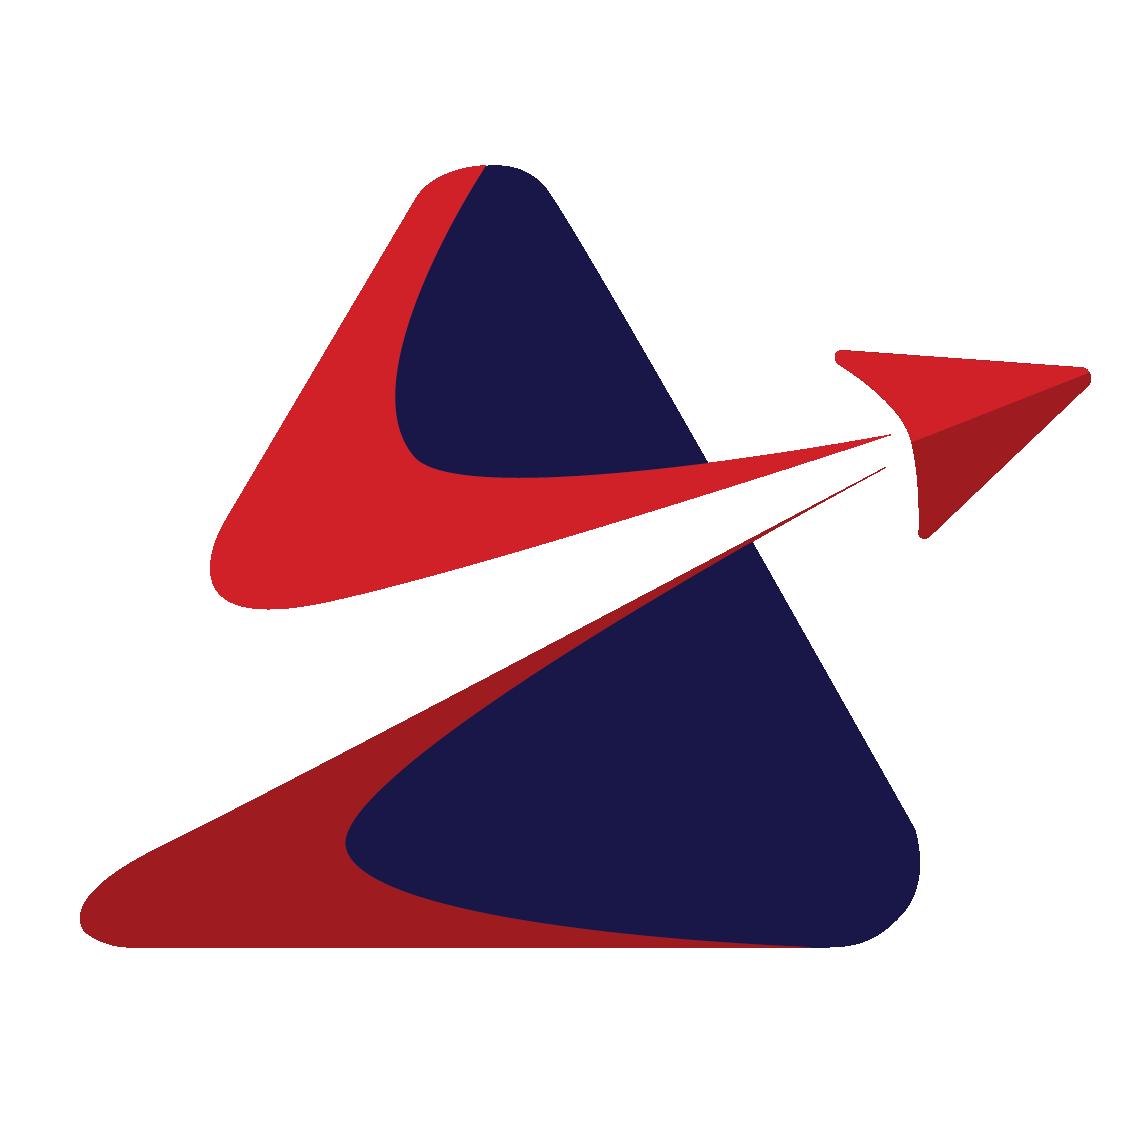 www.aviacionnews.com